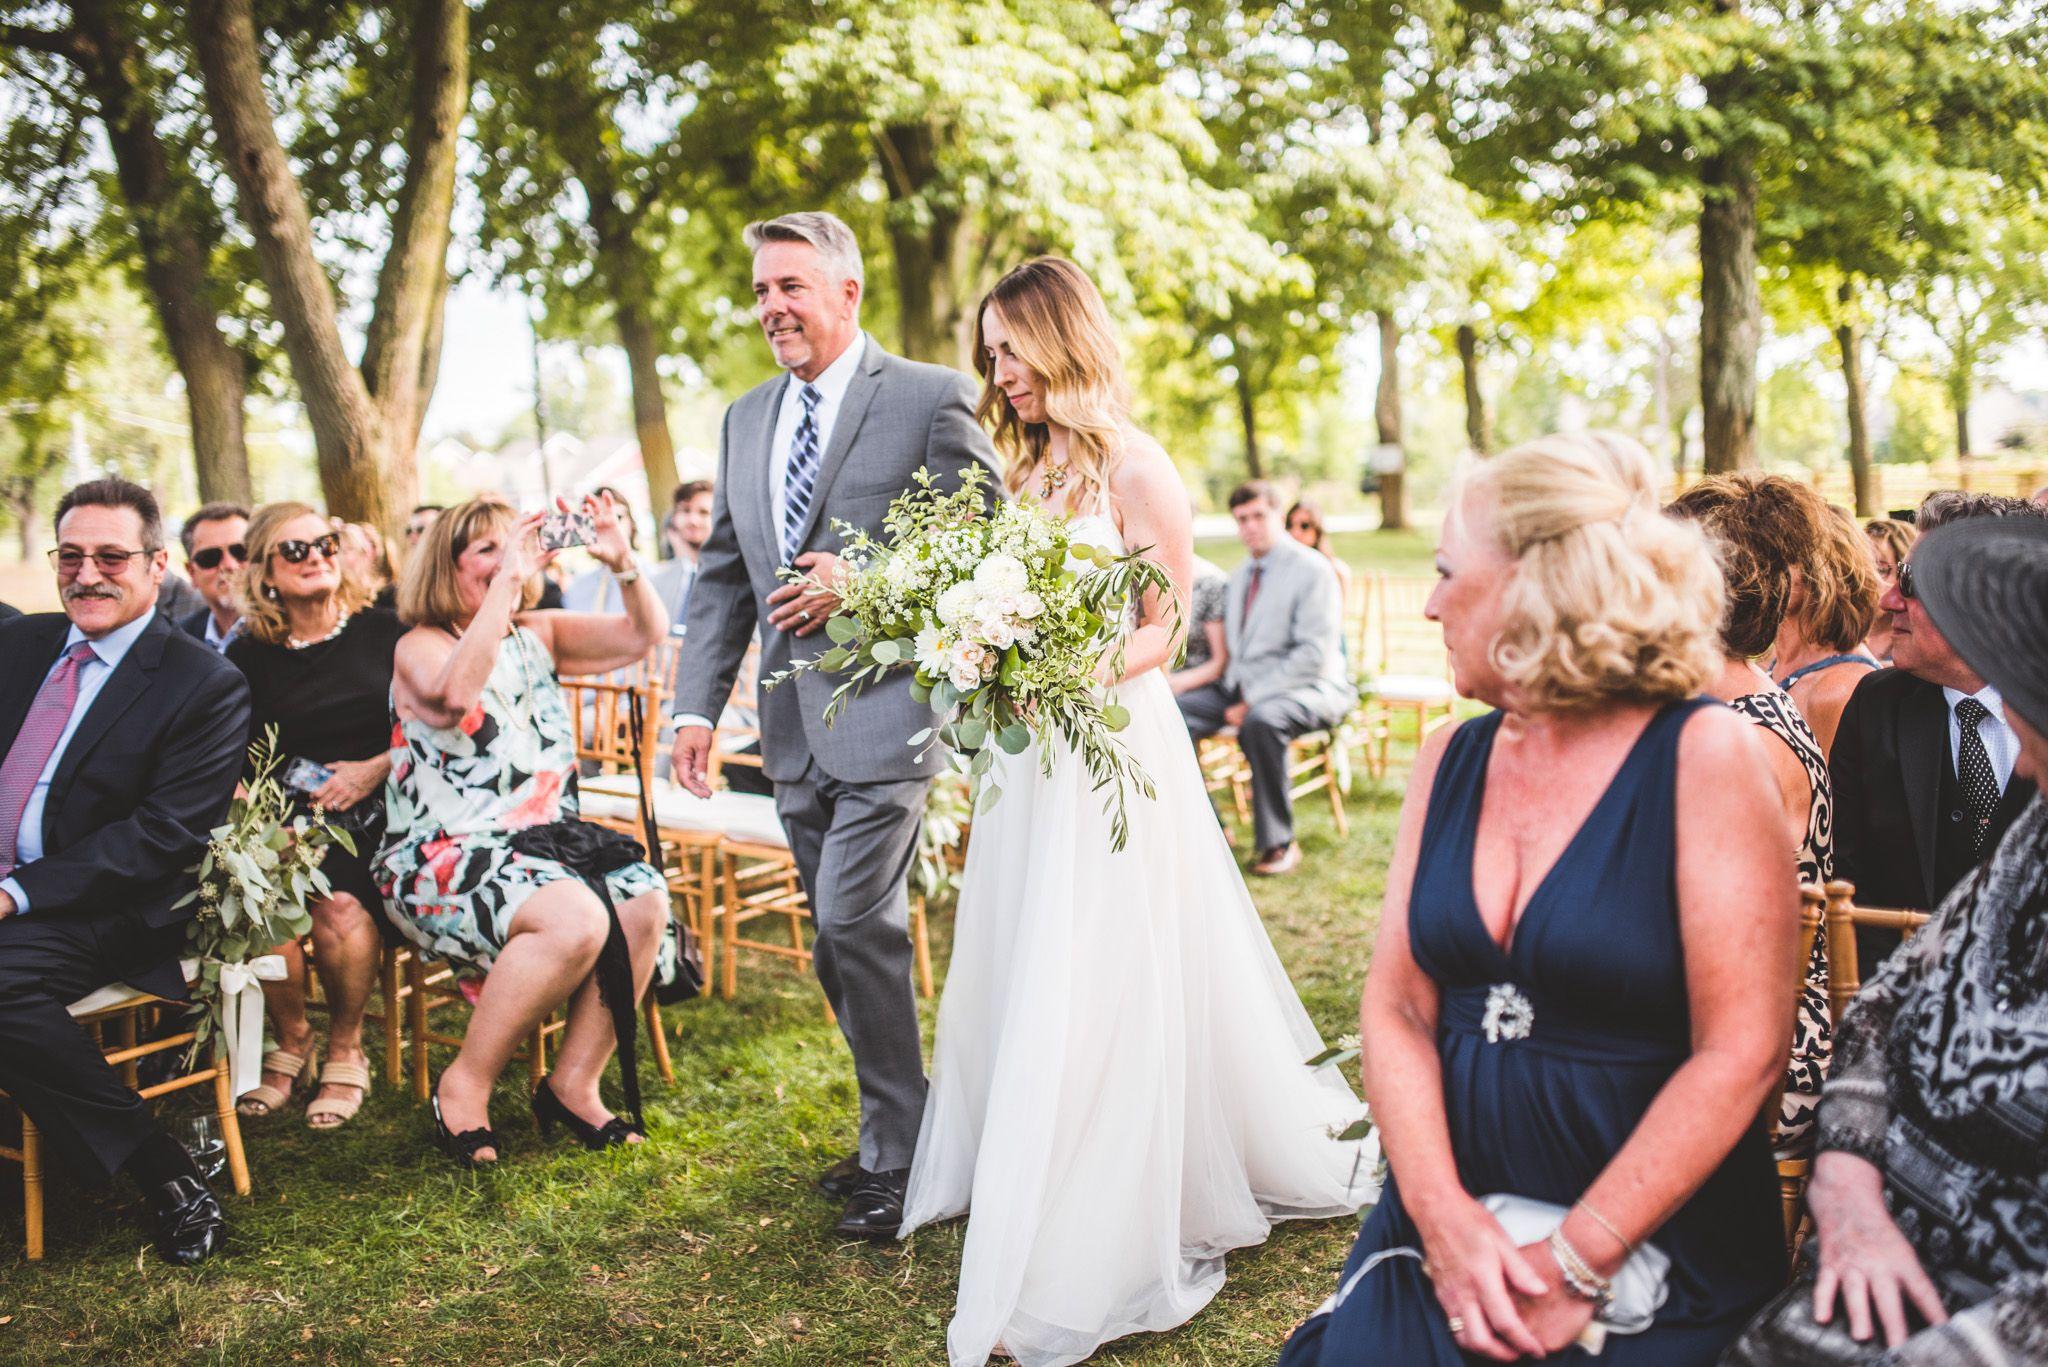 Wedding at Zingerman's Cornman Farms in Michigan. Rustic ...